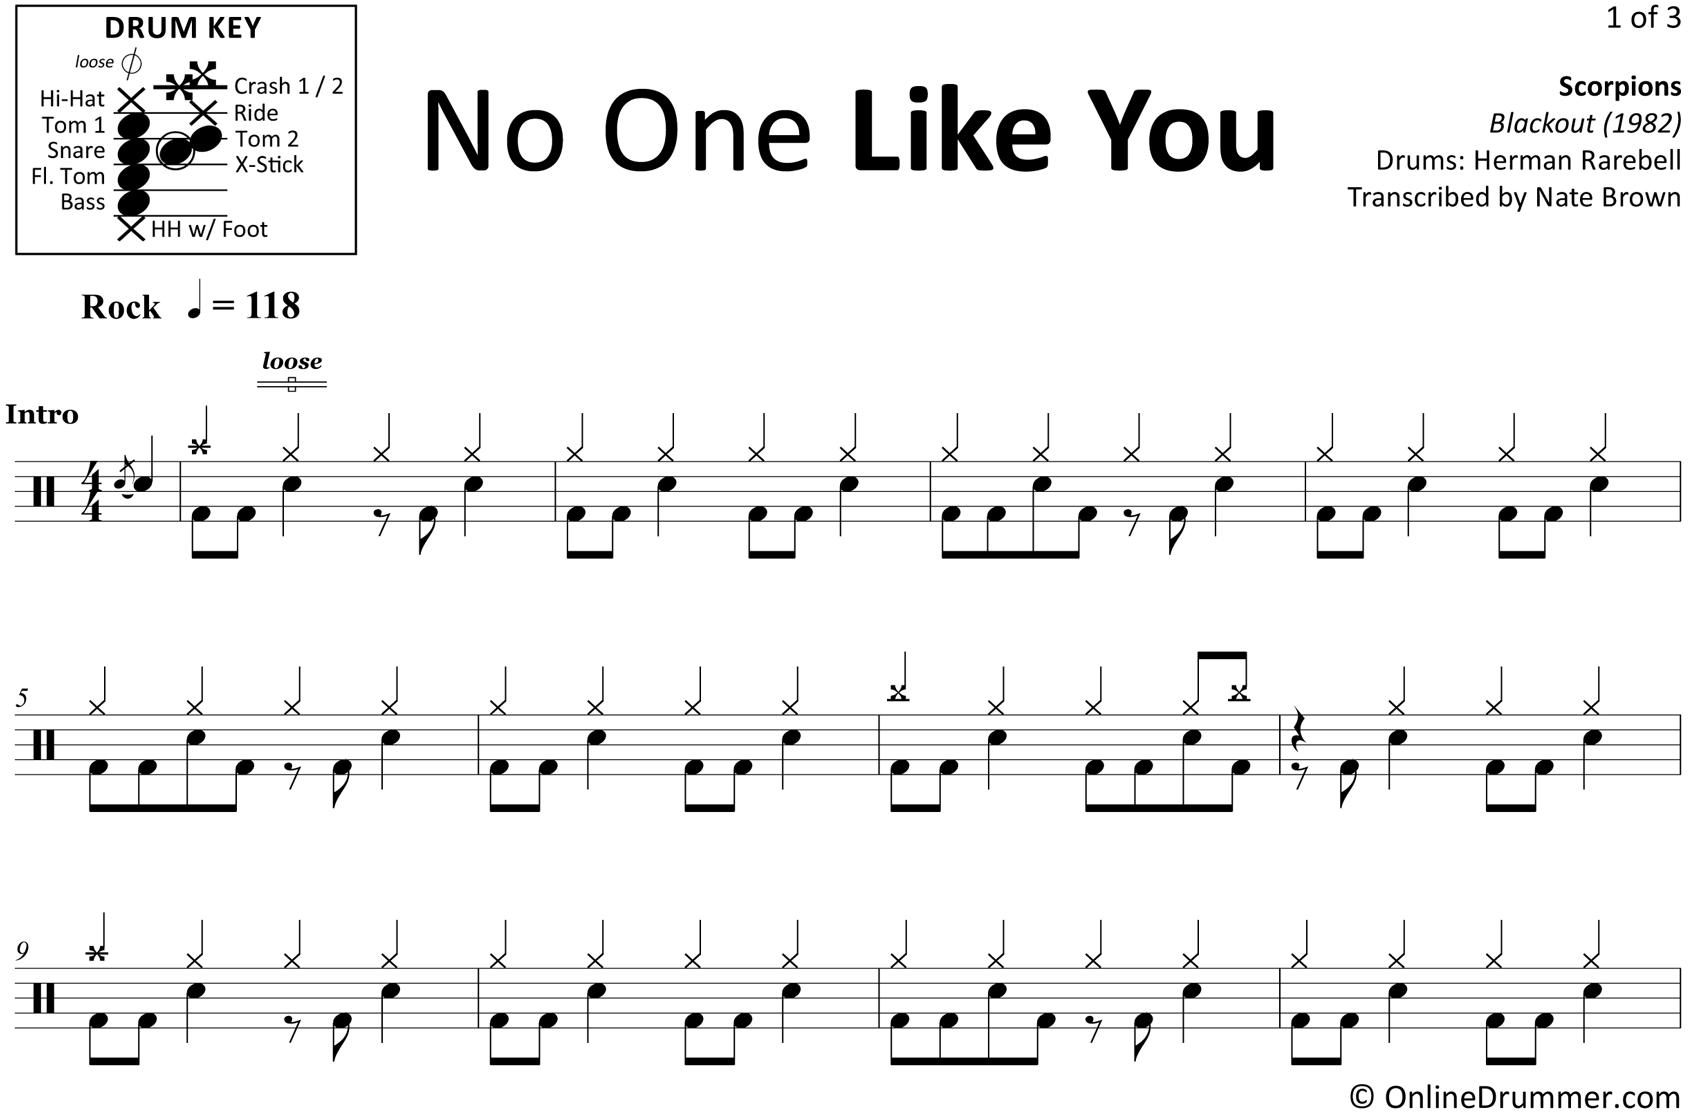 No One Like You - Scorpions - Drum Sheet Music